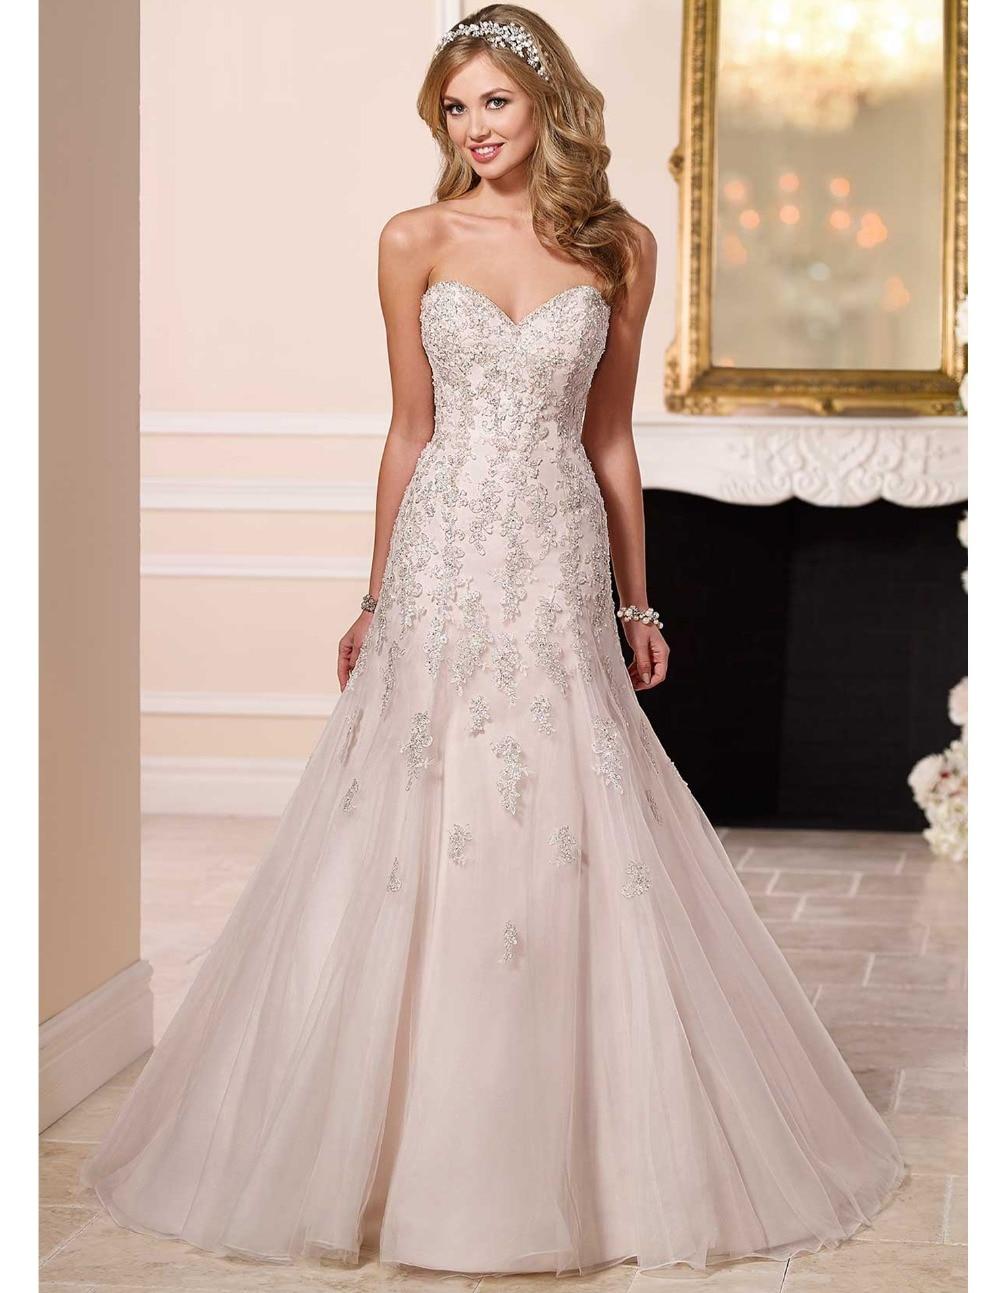 Michael Kors Wedding Dresses | Dress images